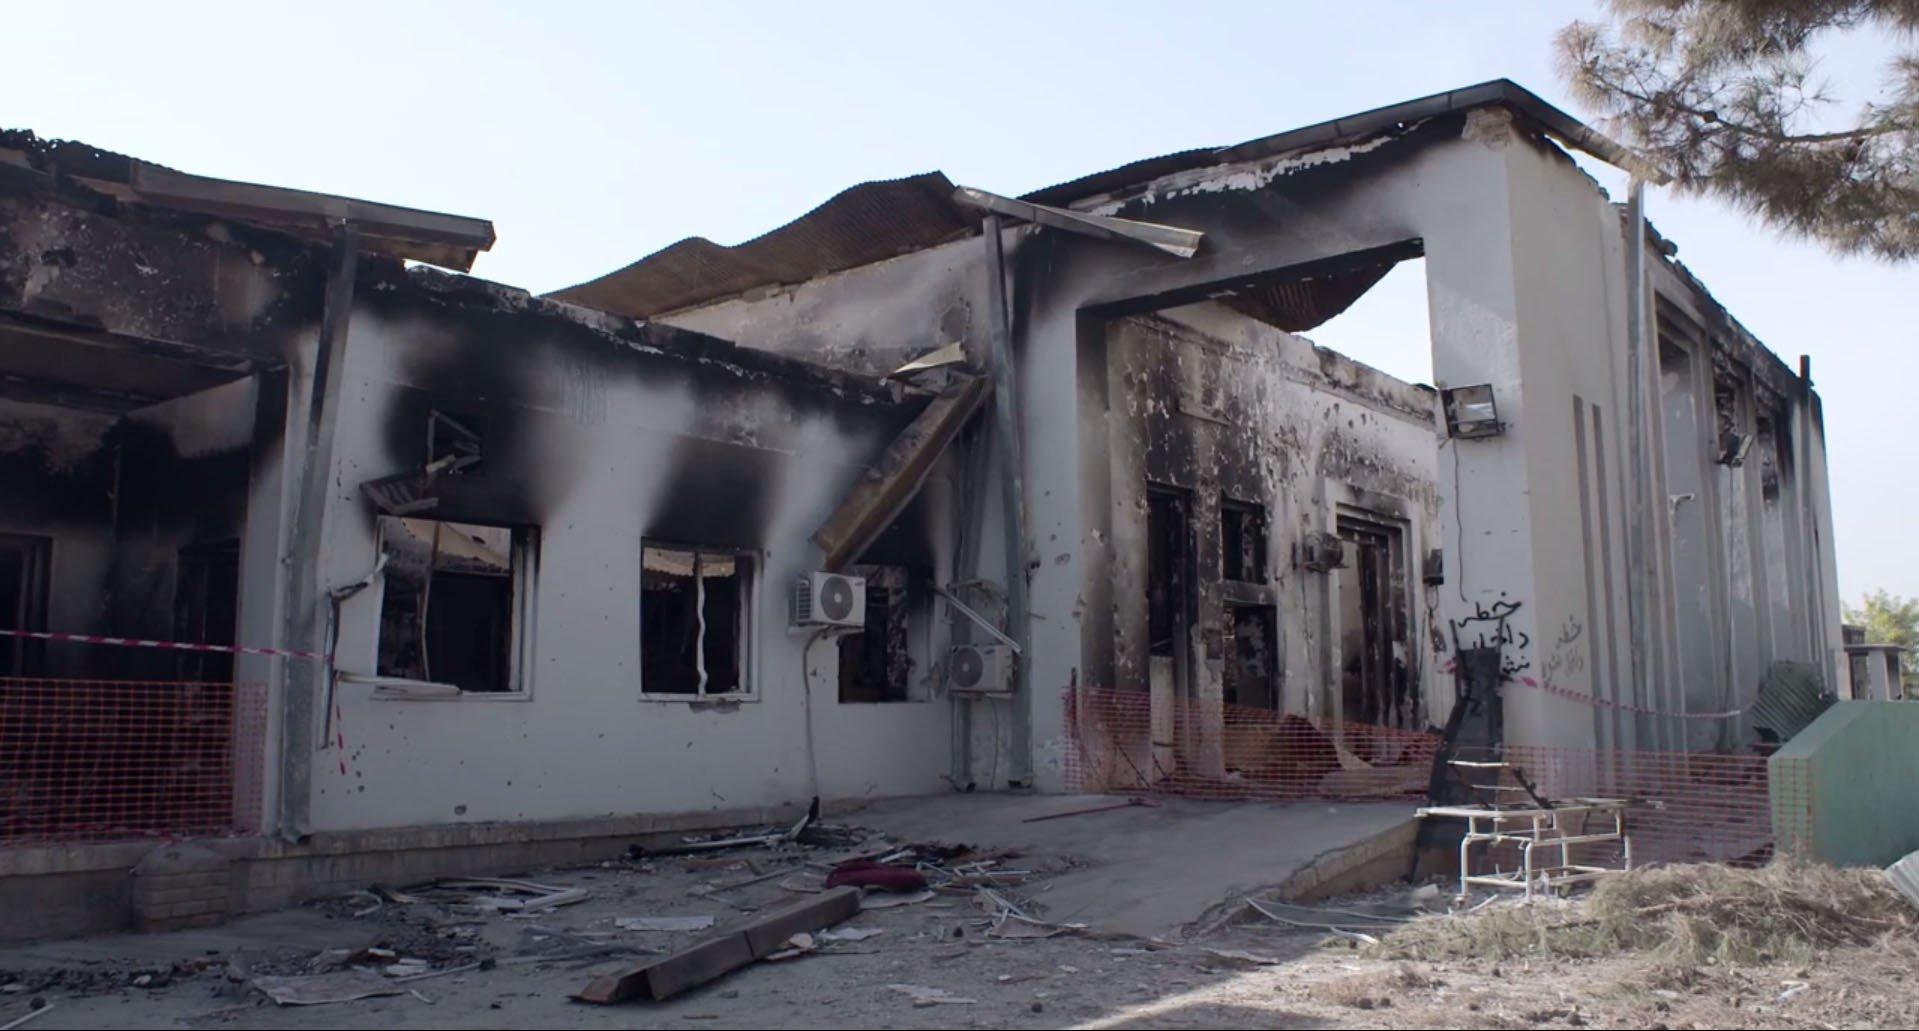 Aftermath of airstrike on Kunduz MSF hospital